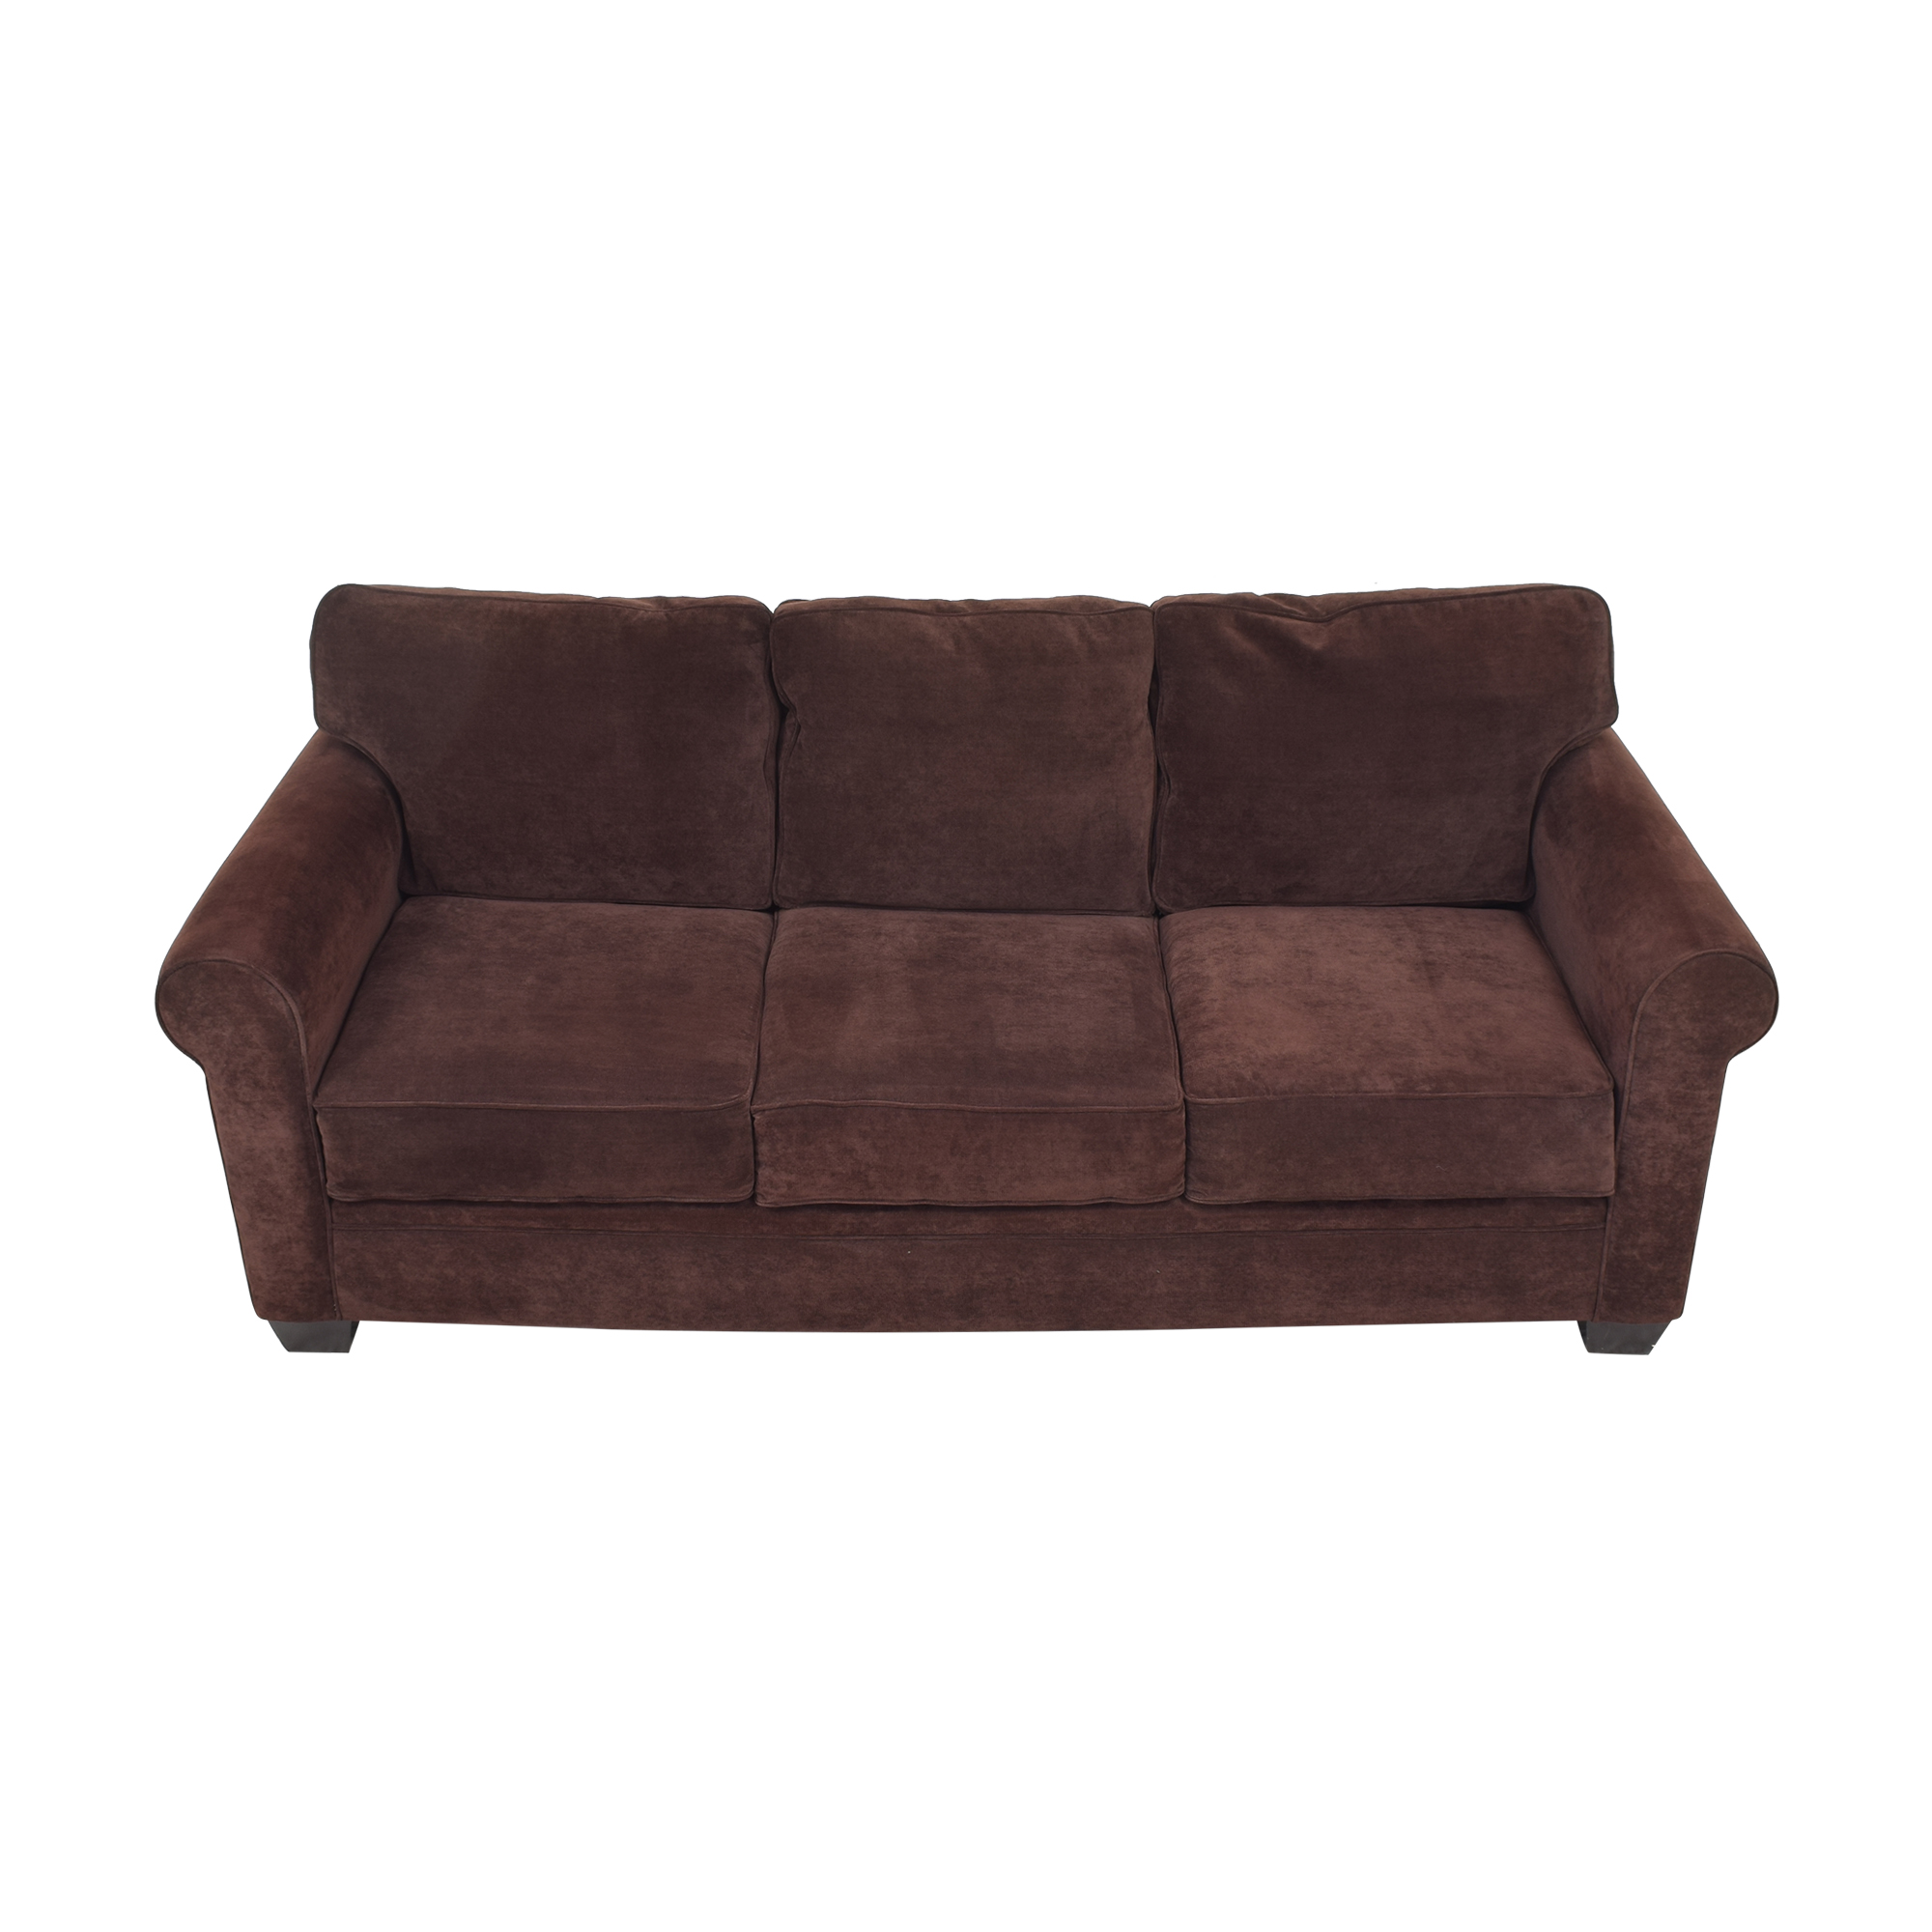 buy Jonathan Louis Jonathan Louis Orion Sofa online